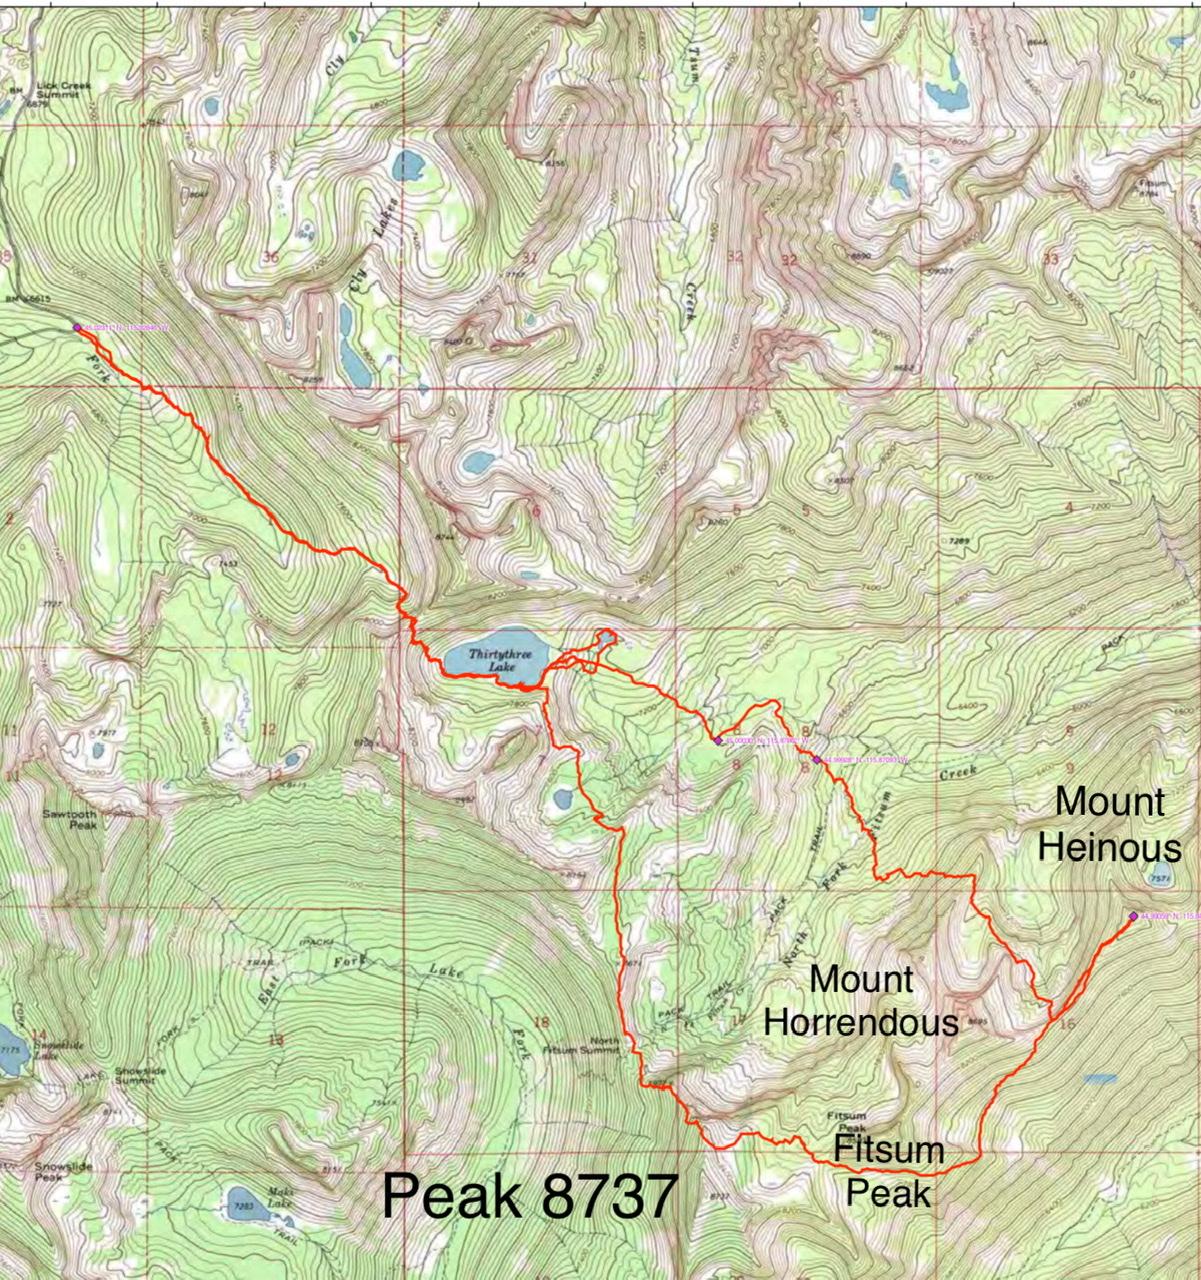 John Platt's route from Thirtythree Lake to Mount Heinous and back.